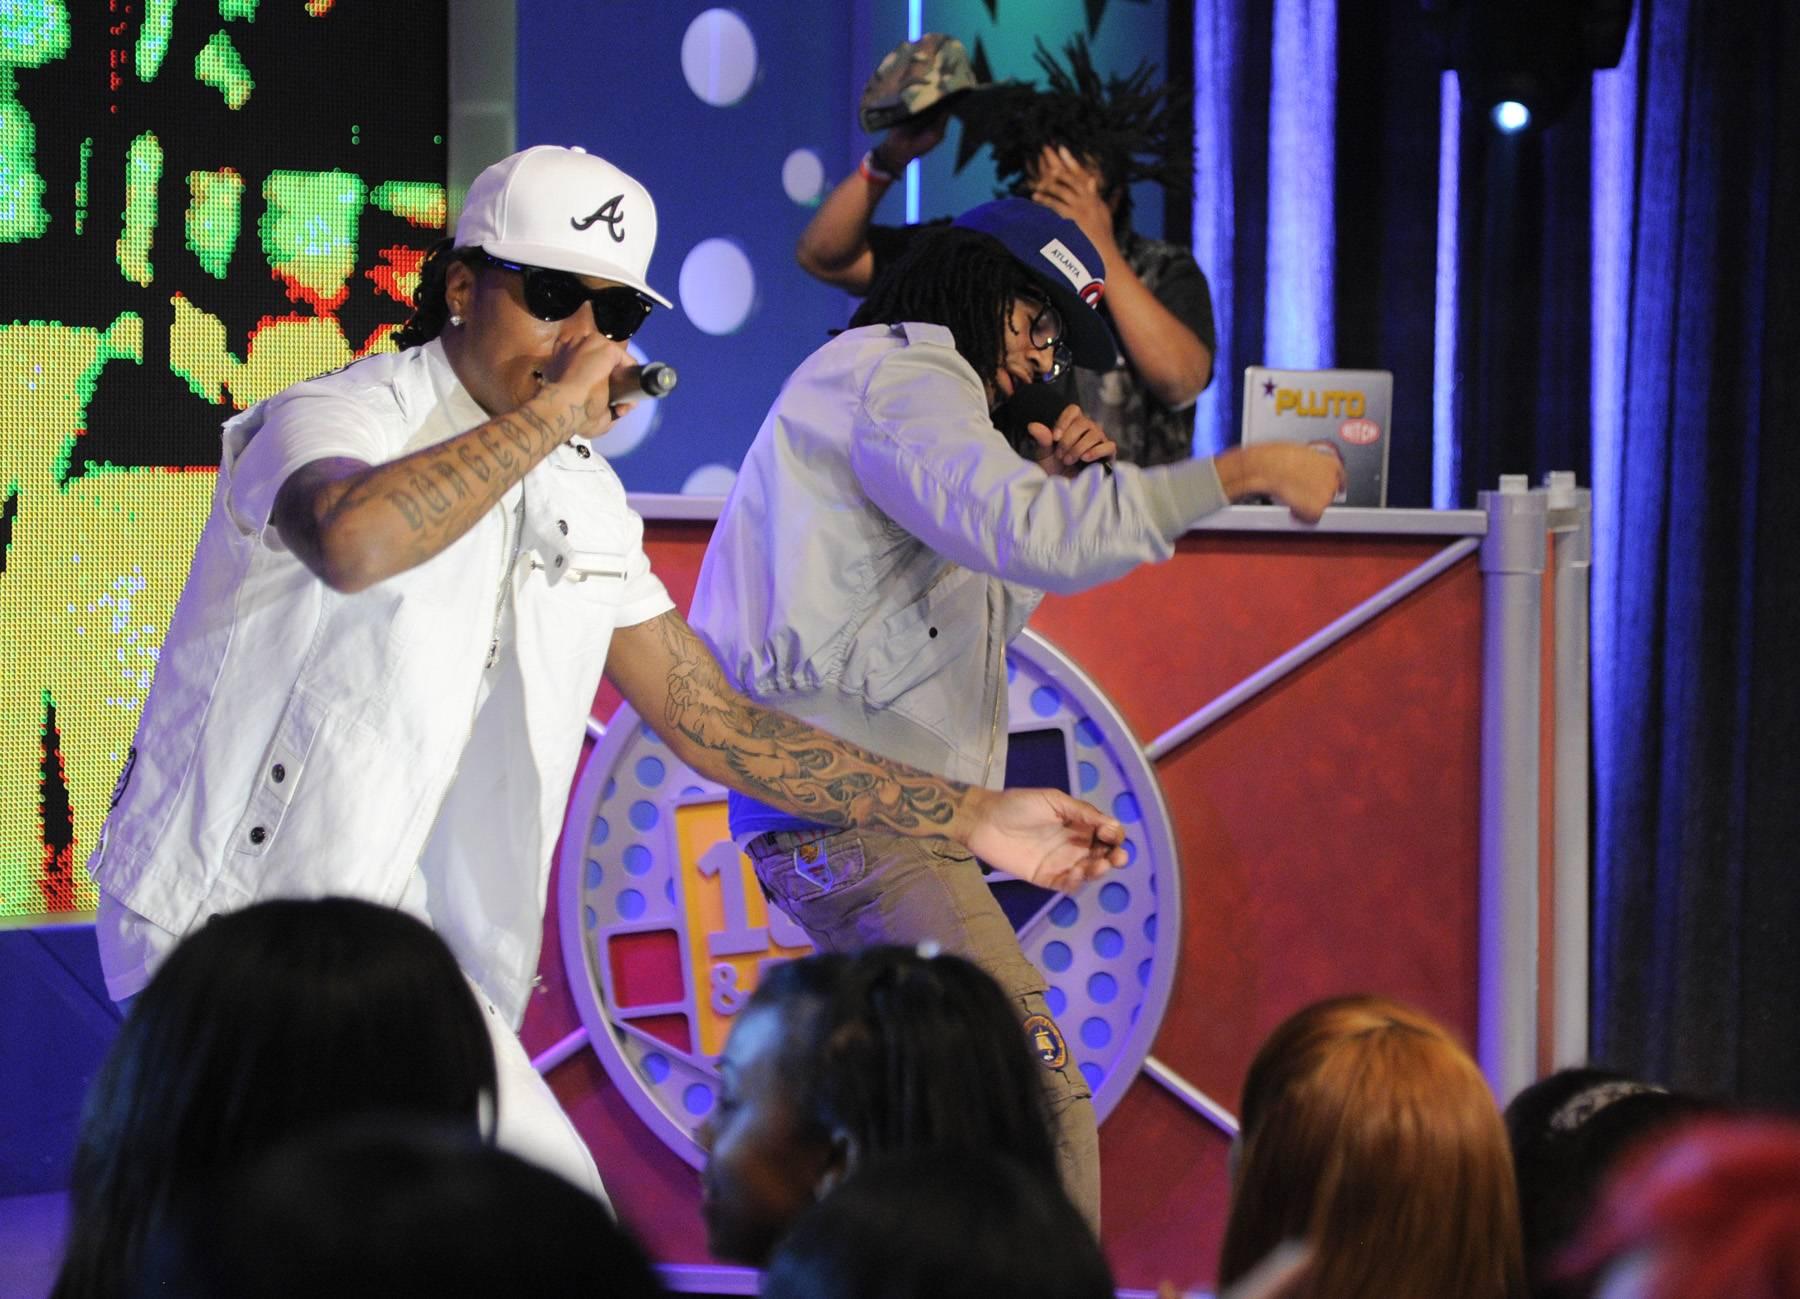 Lets Get It - Future performs at 106 & Park, April 20, 2012. (Photo: John Ricard / BET)